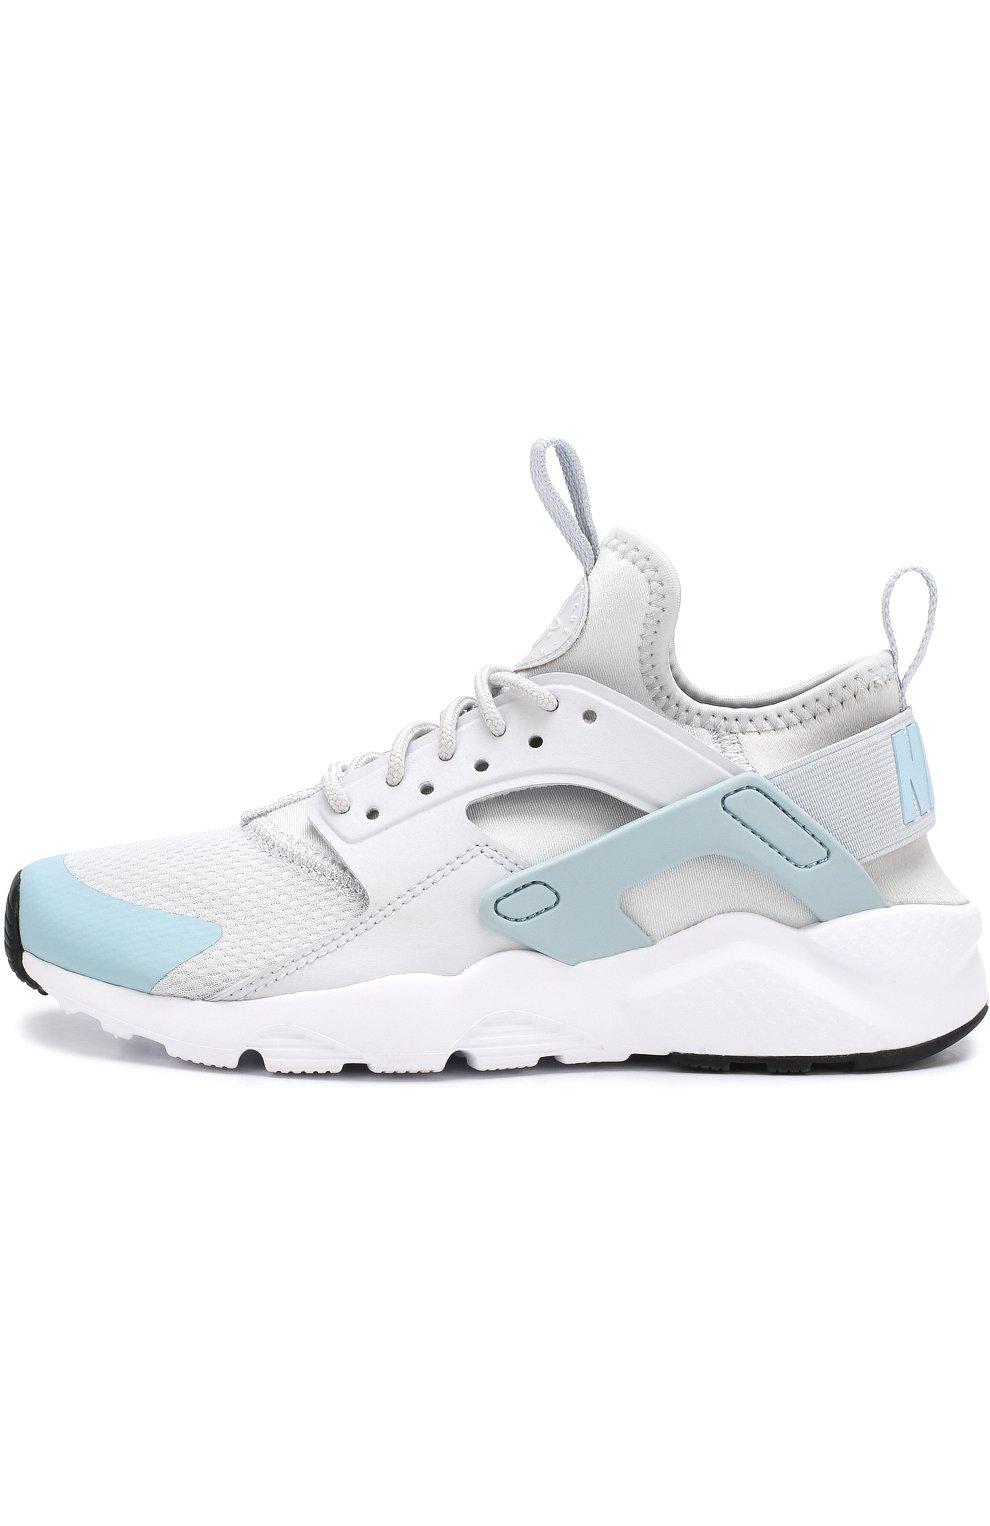 1762eea0 Детские текстильные кроссовки nike air huarache ultra Nike светло-серого  цвета   Фото №2